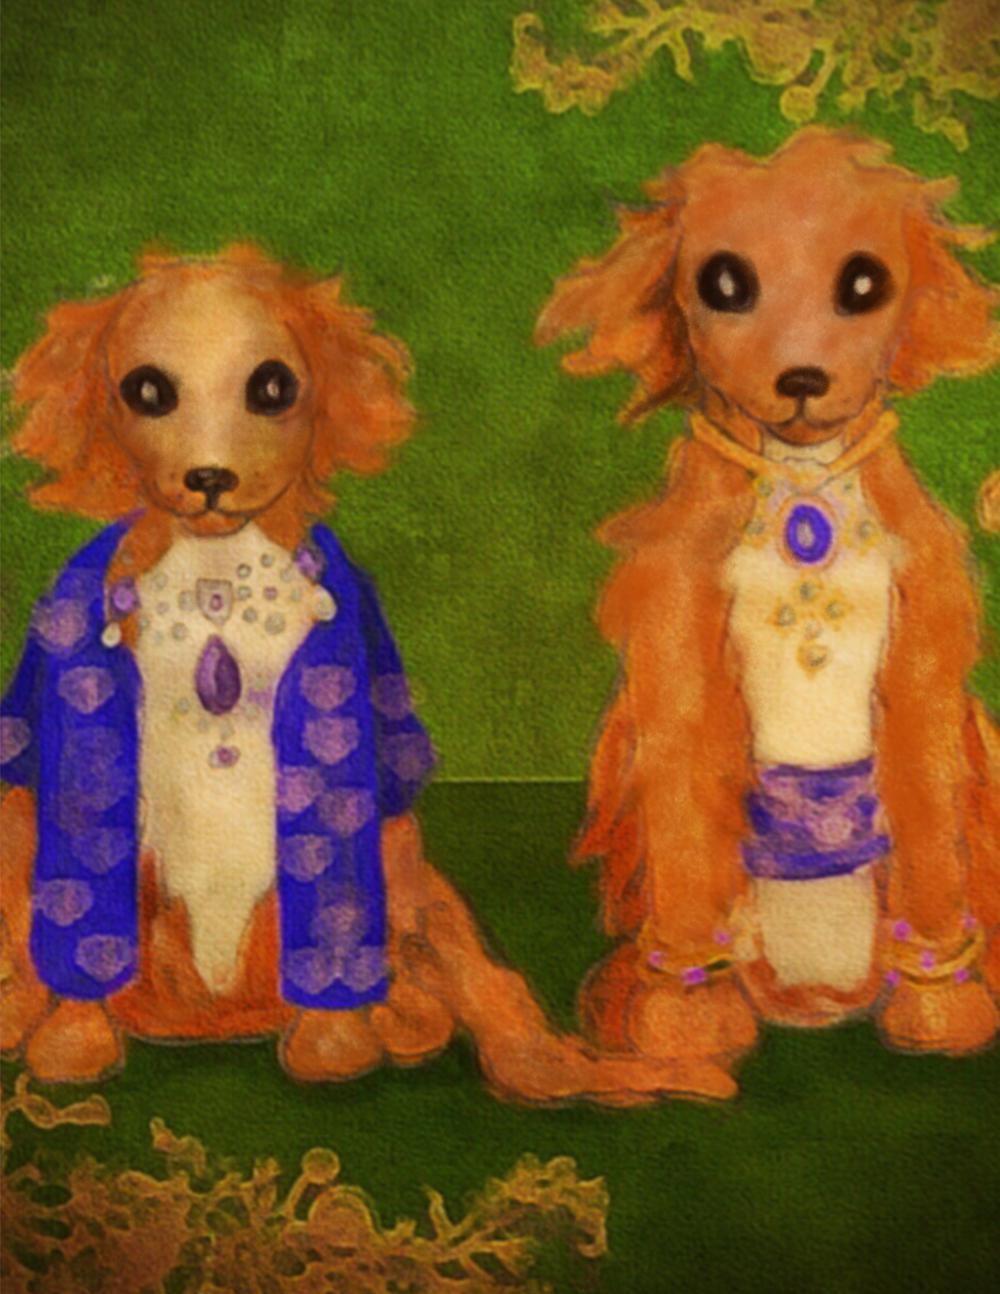 Dog Weddings in History